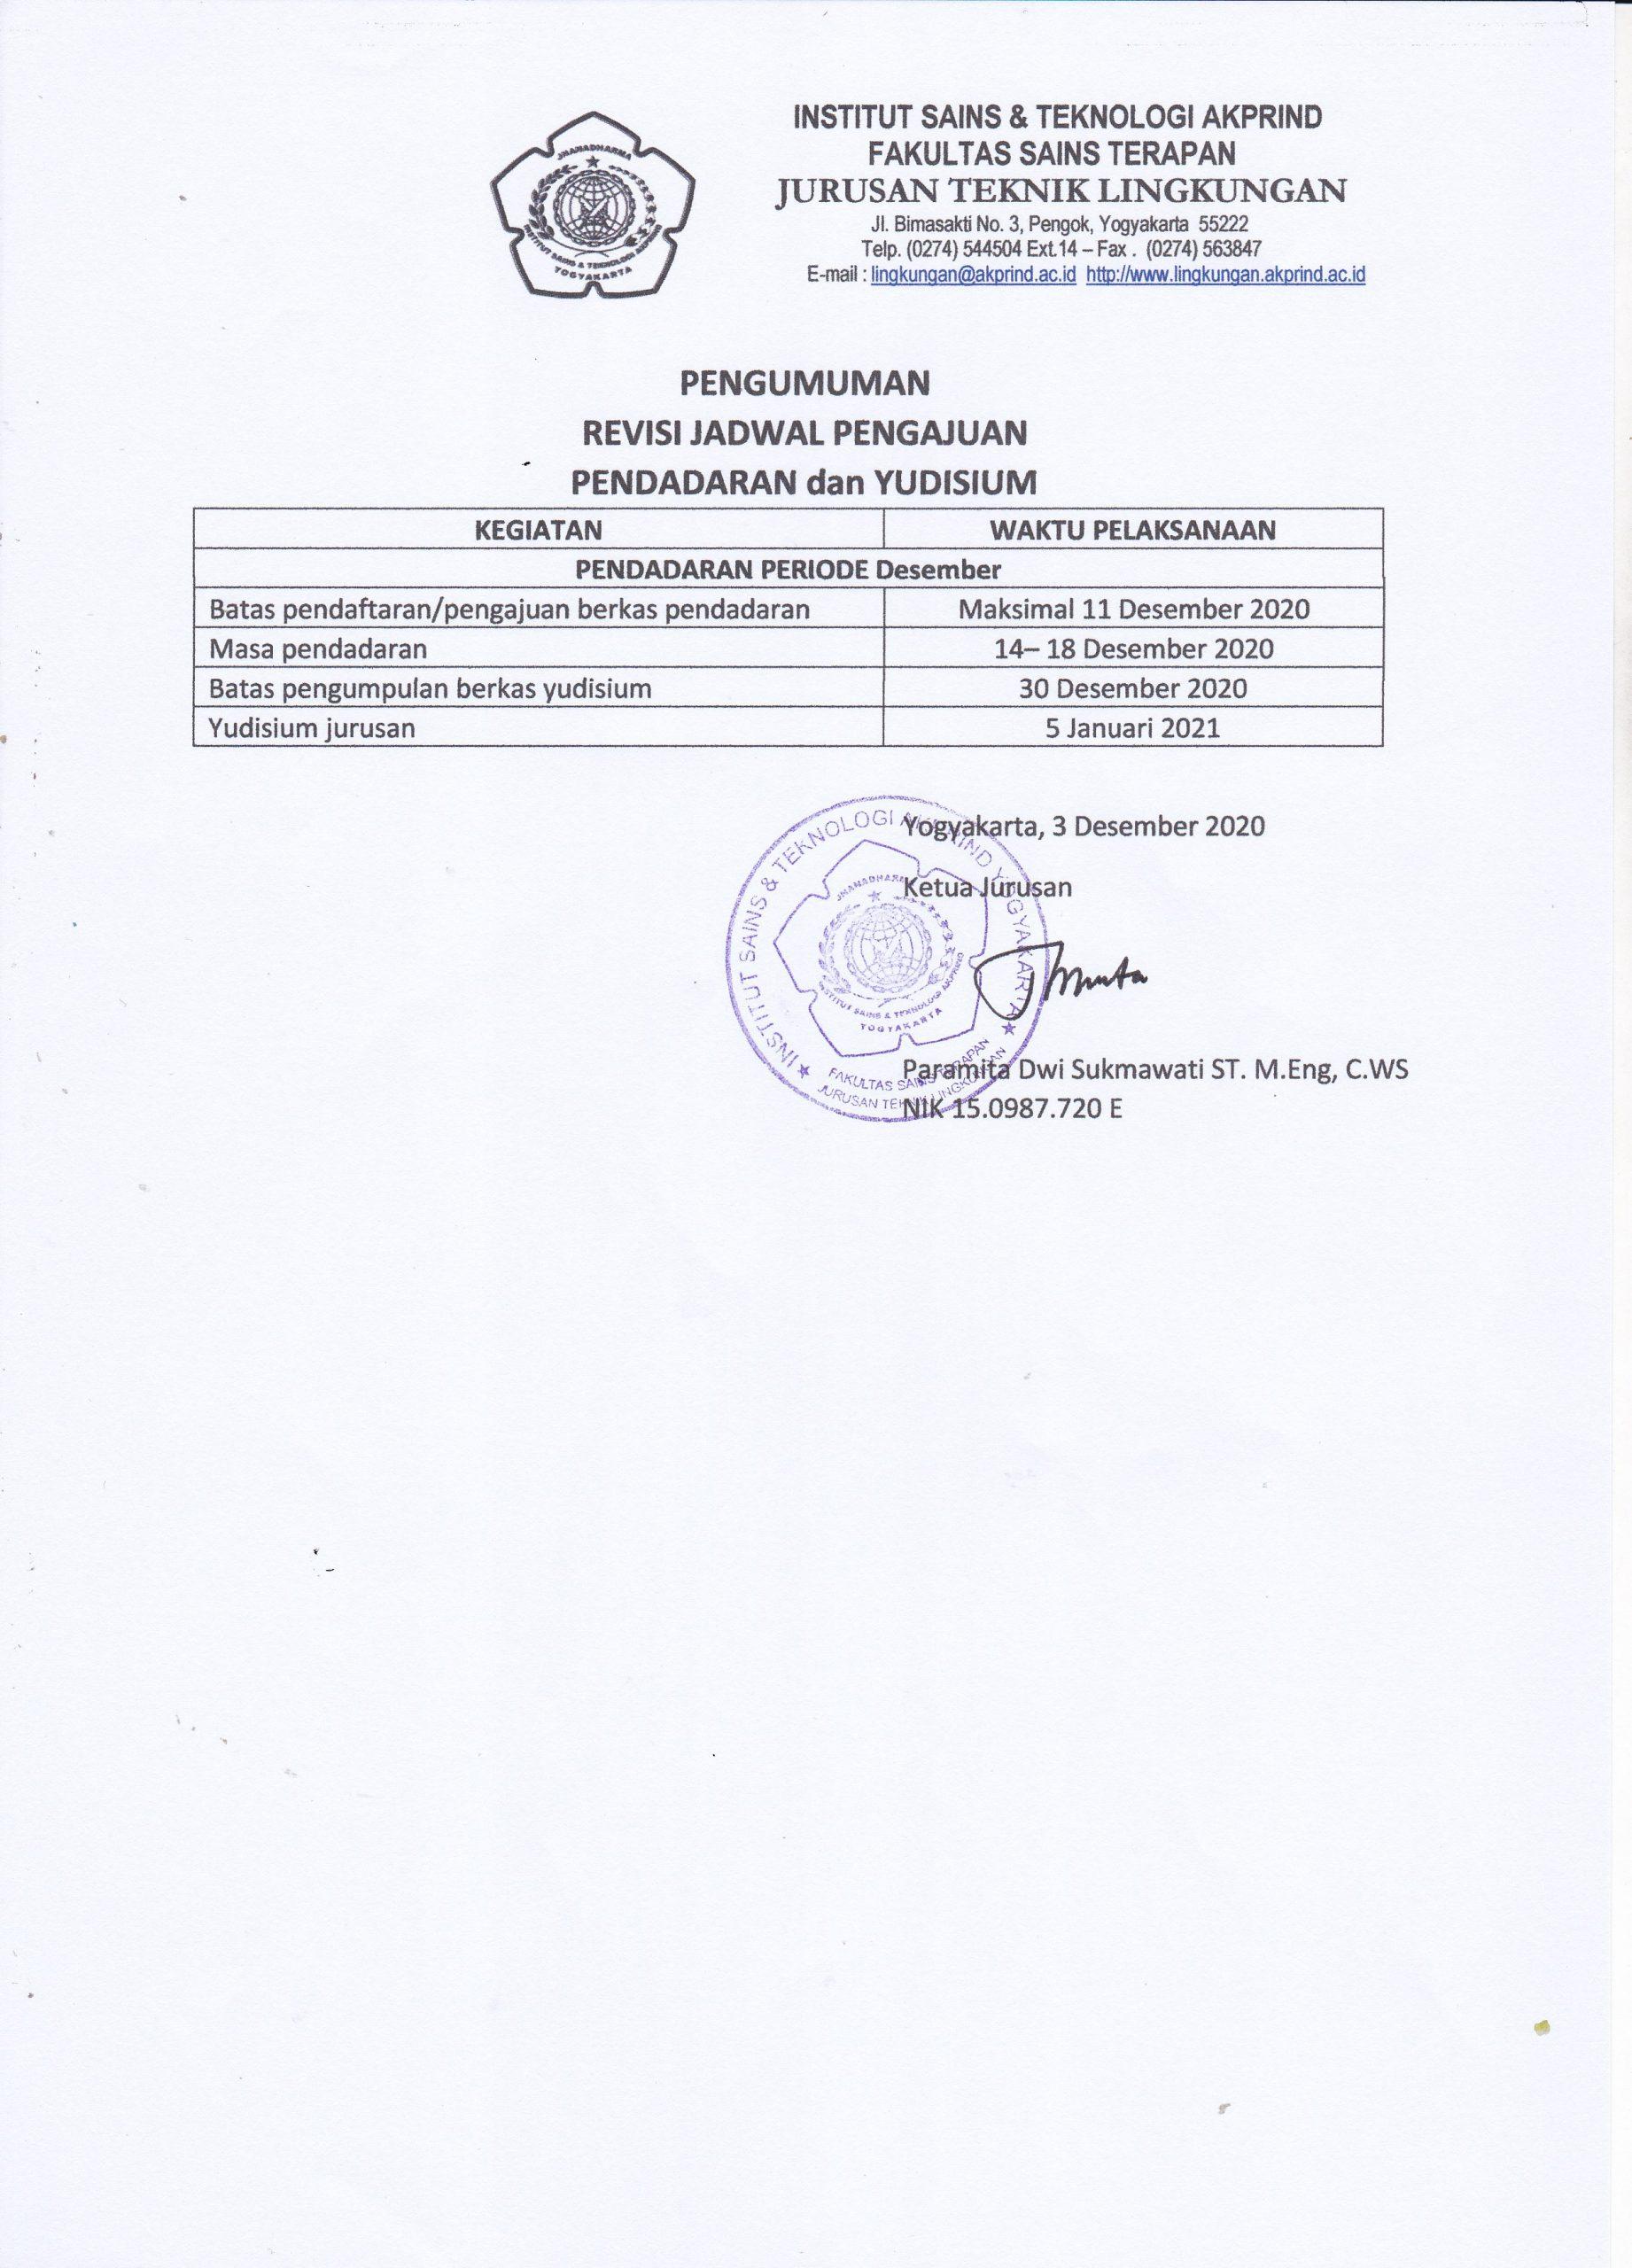 Pengumuman  Jadwal Pengajuan Pendadaran Dan Yudisium Semester Genap 2020/2021